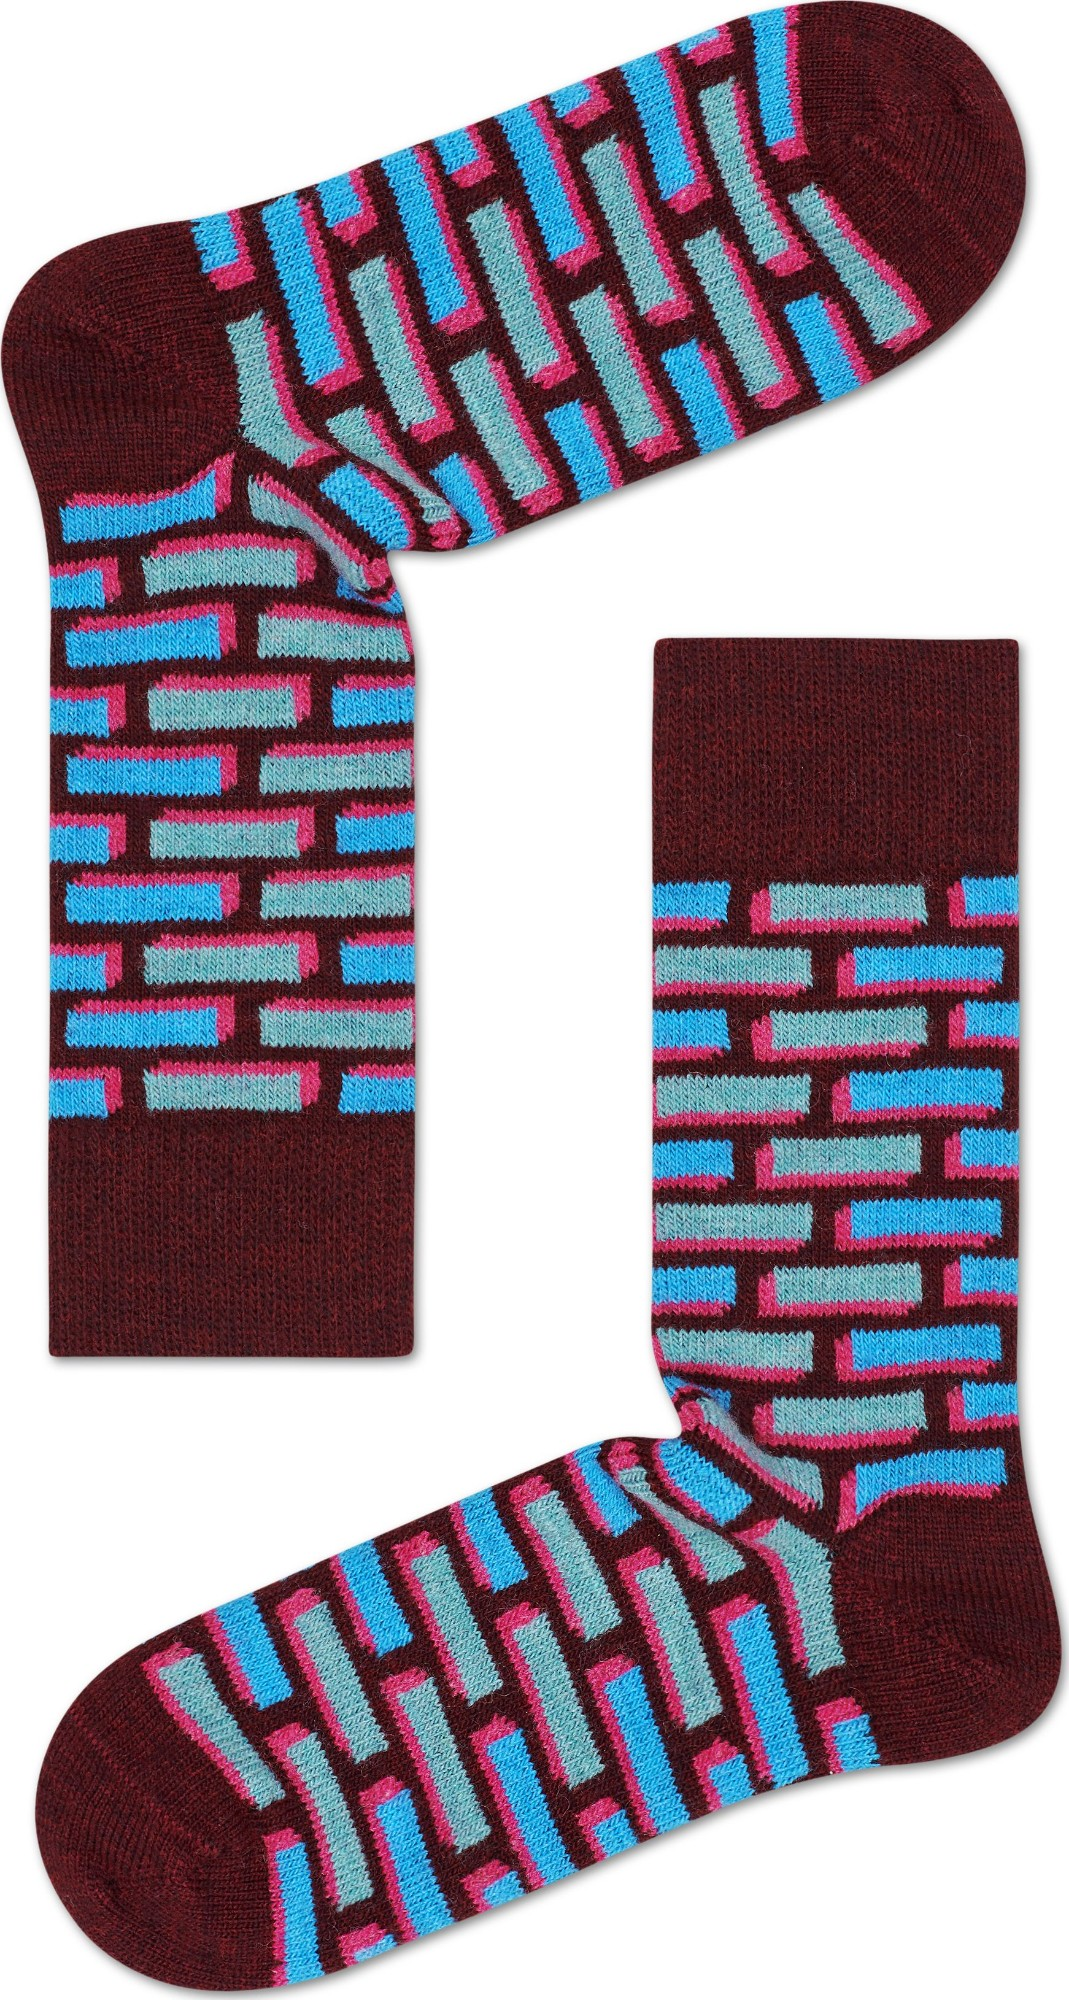 Happy Socks Wool Brick Multi 6700 41-46